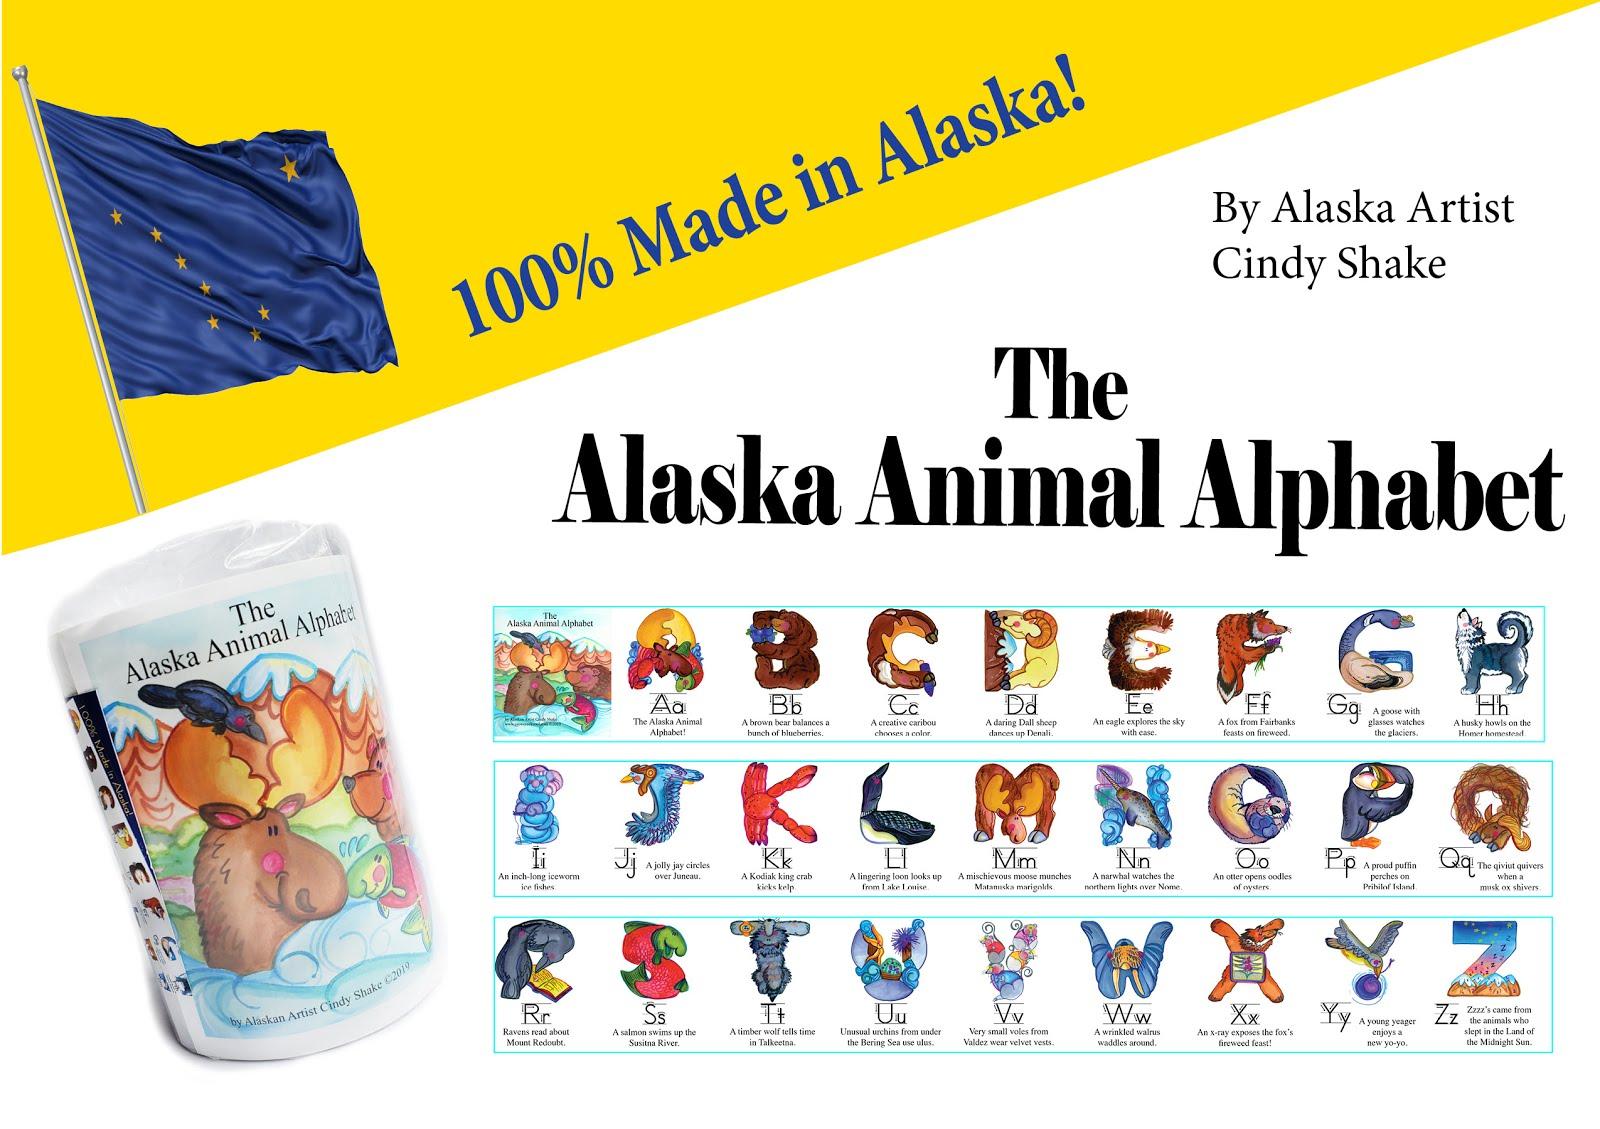 Alaska Animal Alphabet